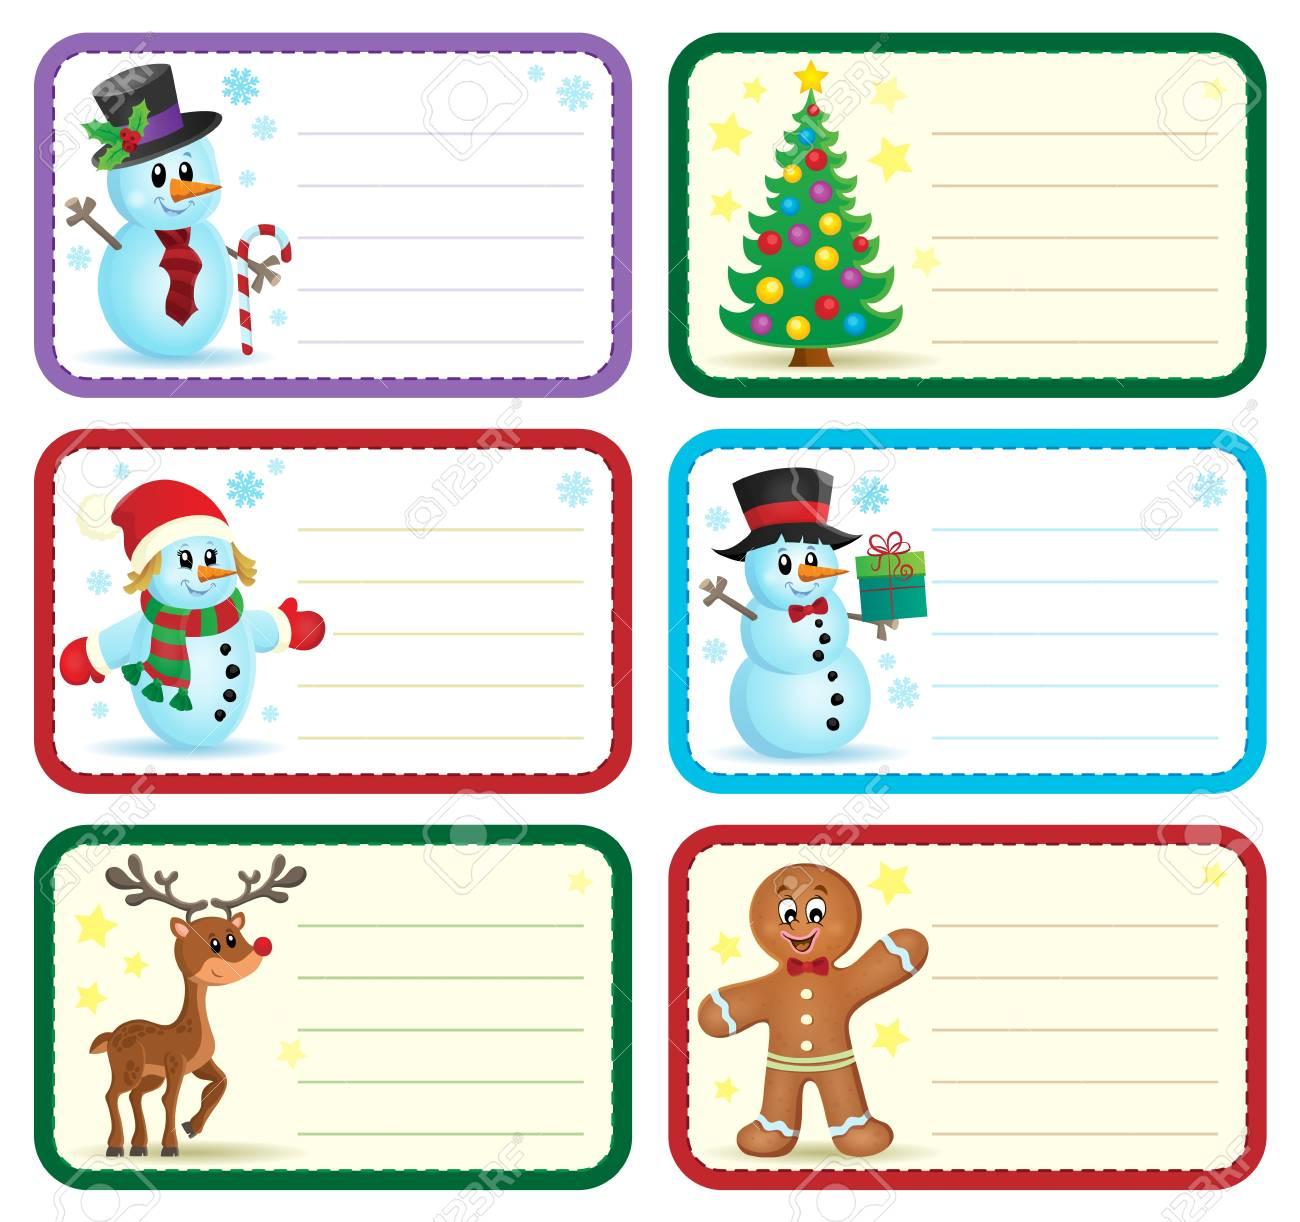 Christmas Name Tags.Christmas Name Tags Collection